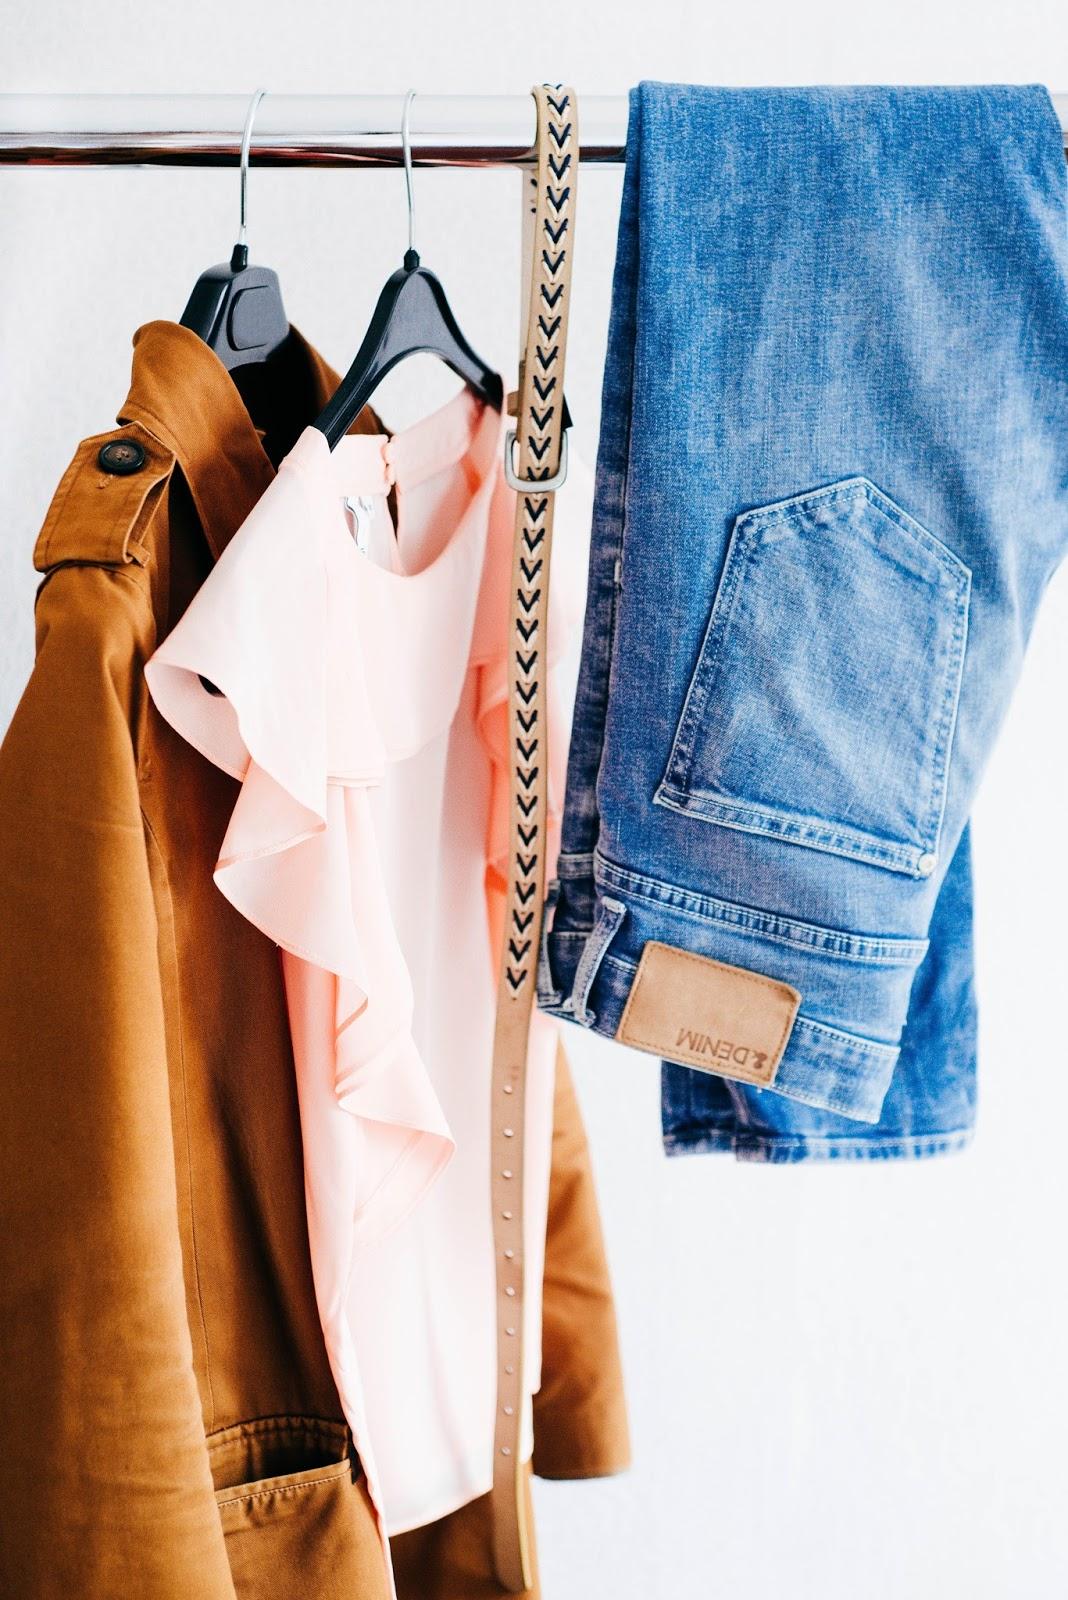 clothing-organization-closet